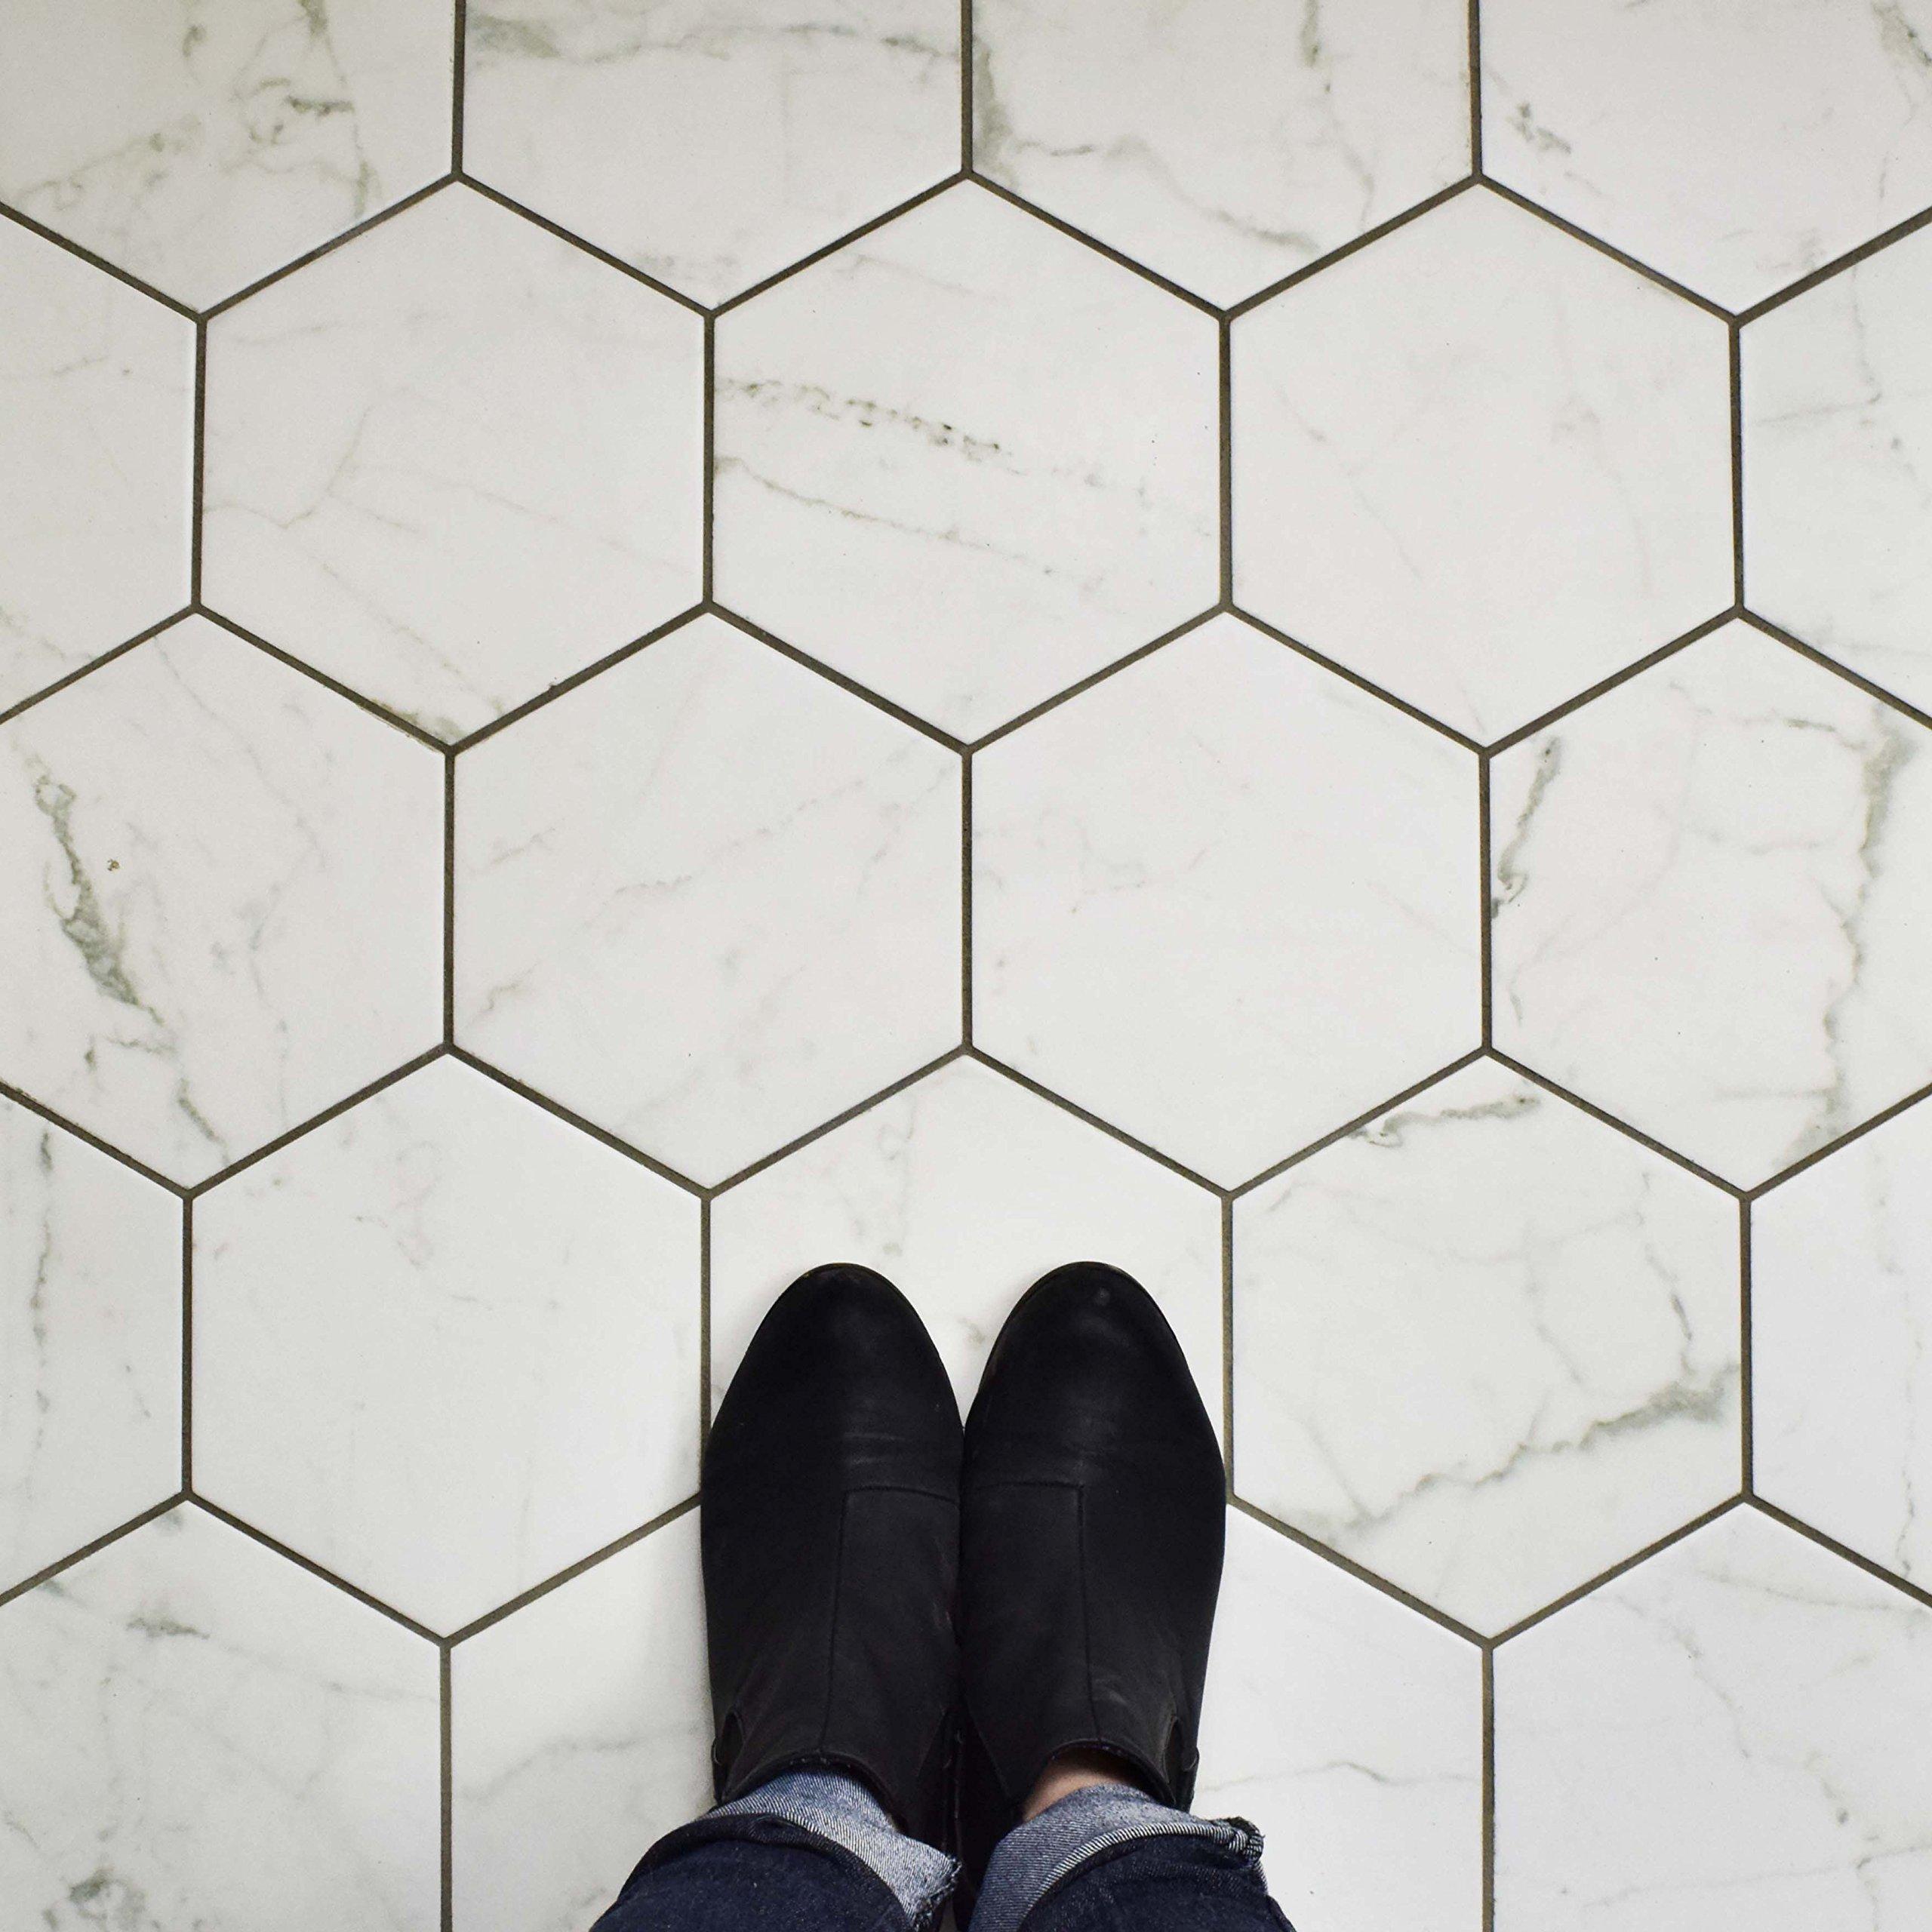 SomerTile FEQCRX Murmur Carrara Hexagon Porcelain Floor & Wall Tile, 7'' x 8'' (Pack of 25) by SOMERTILE (Image #10)